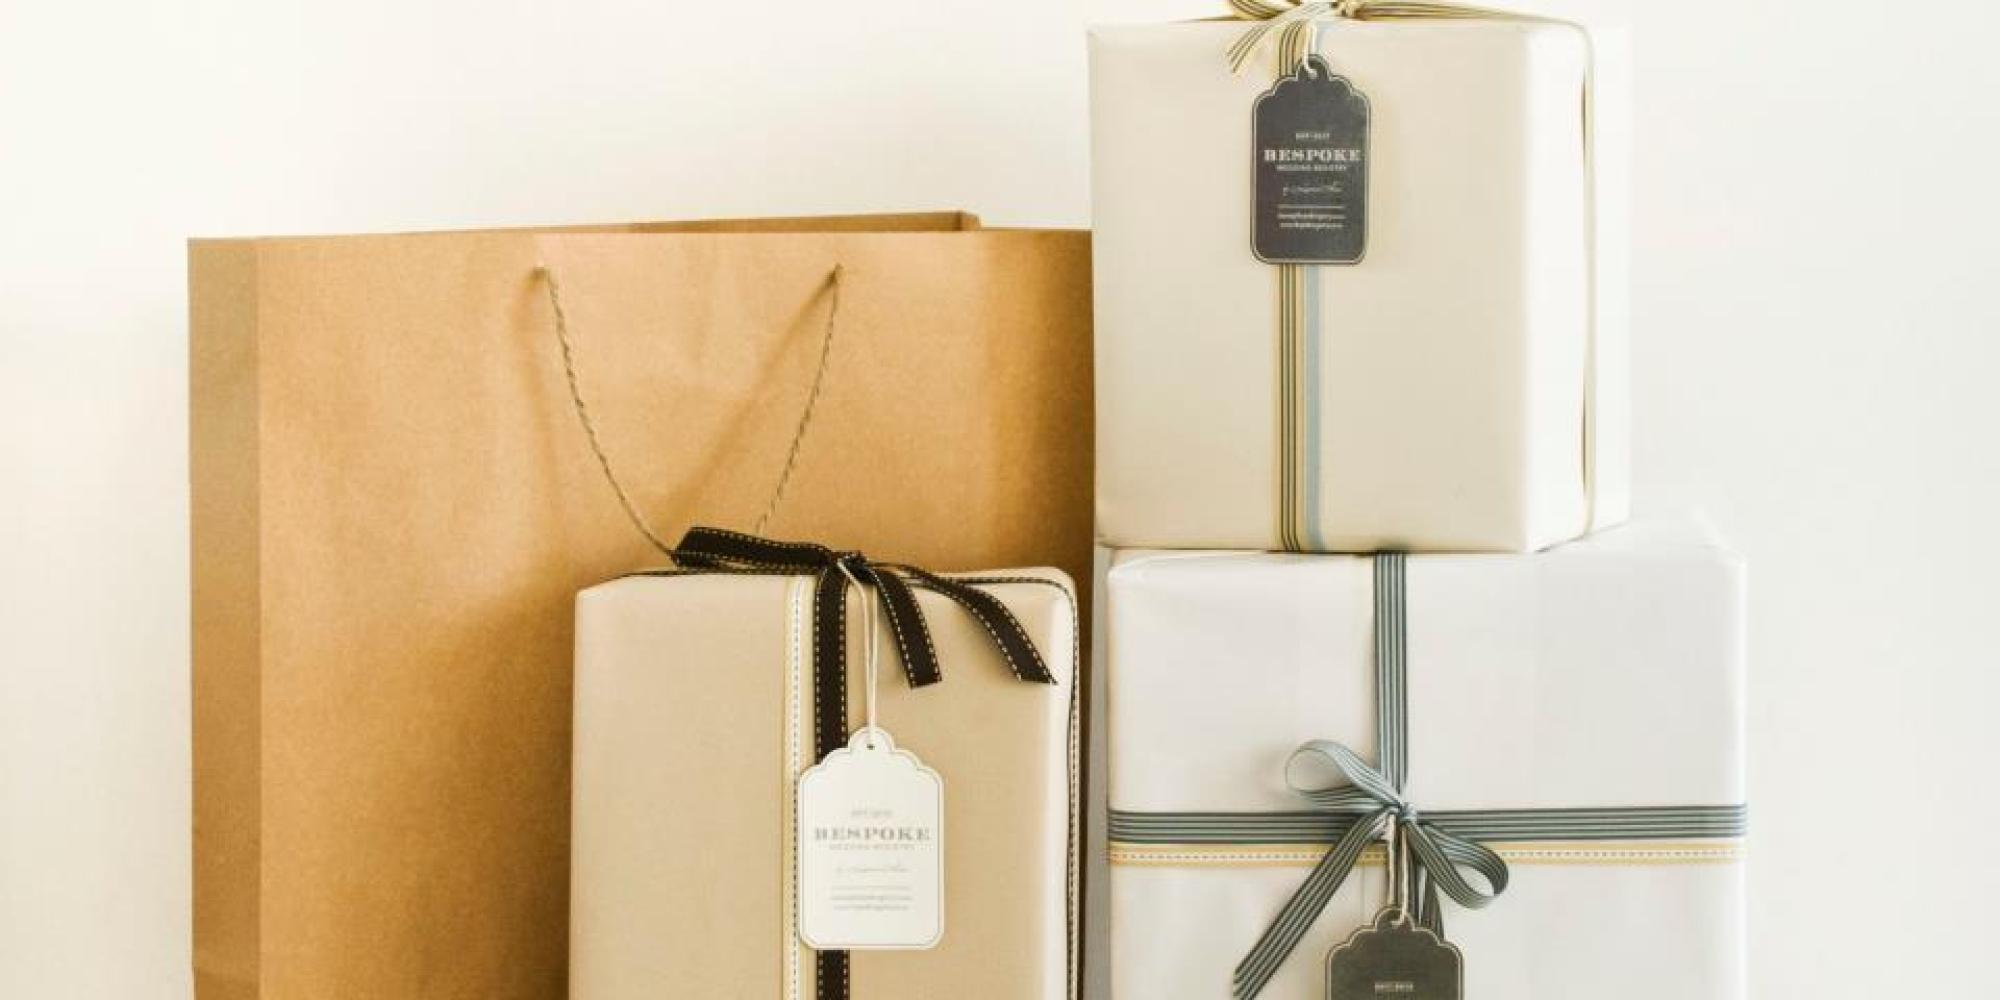 Off Registry Wedding Gifts: Wedding Gifts Worth Buying Off-Registry